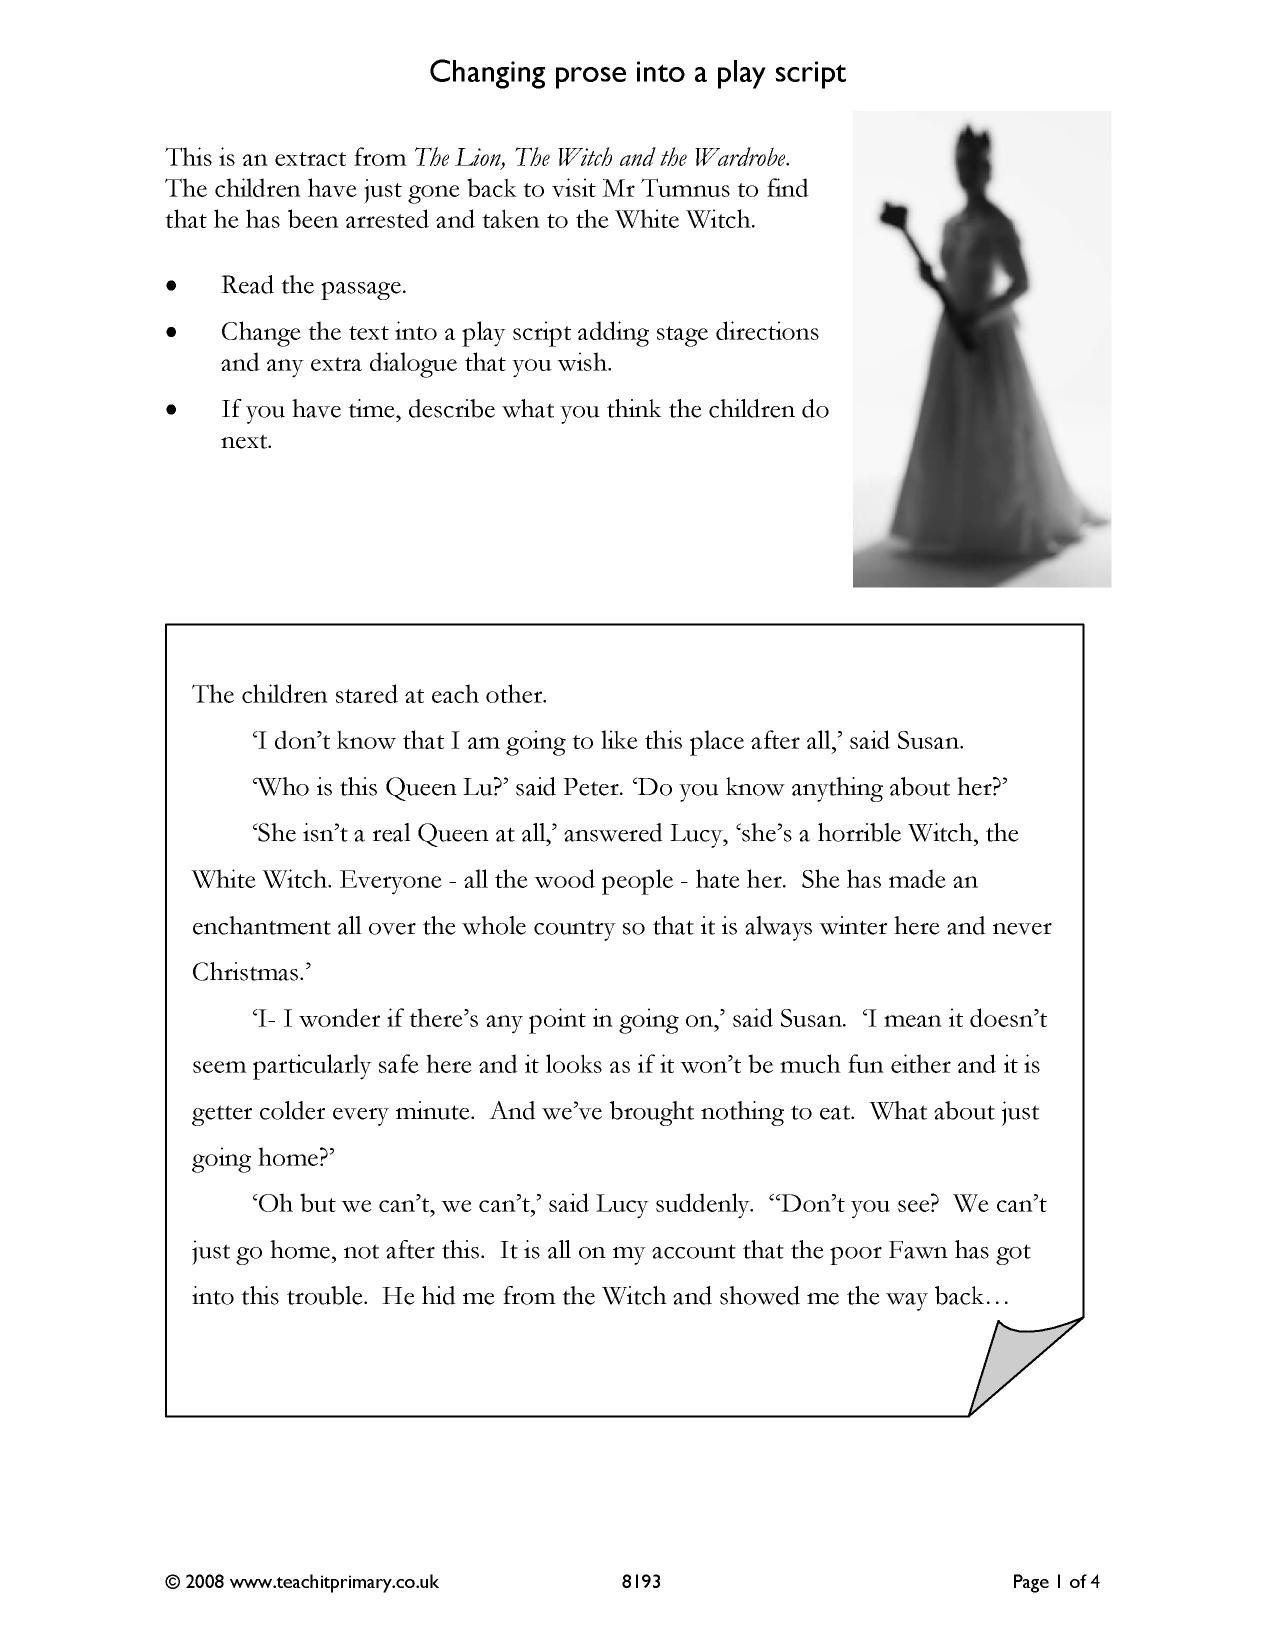 homework playscripts ks2